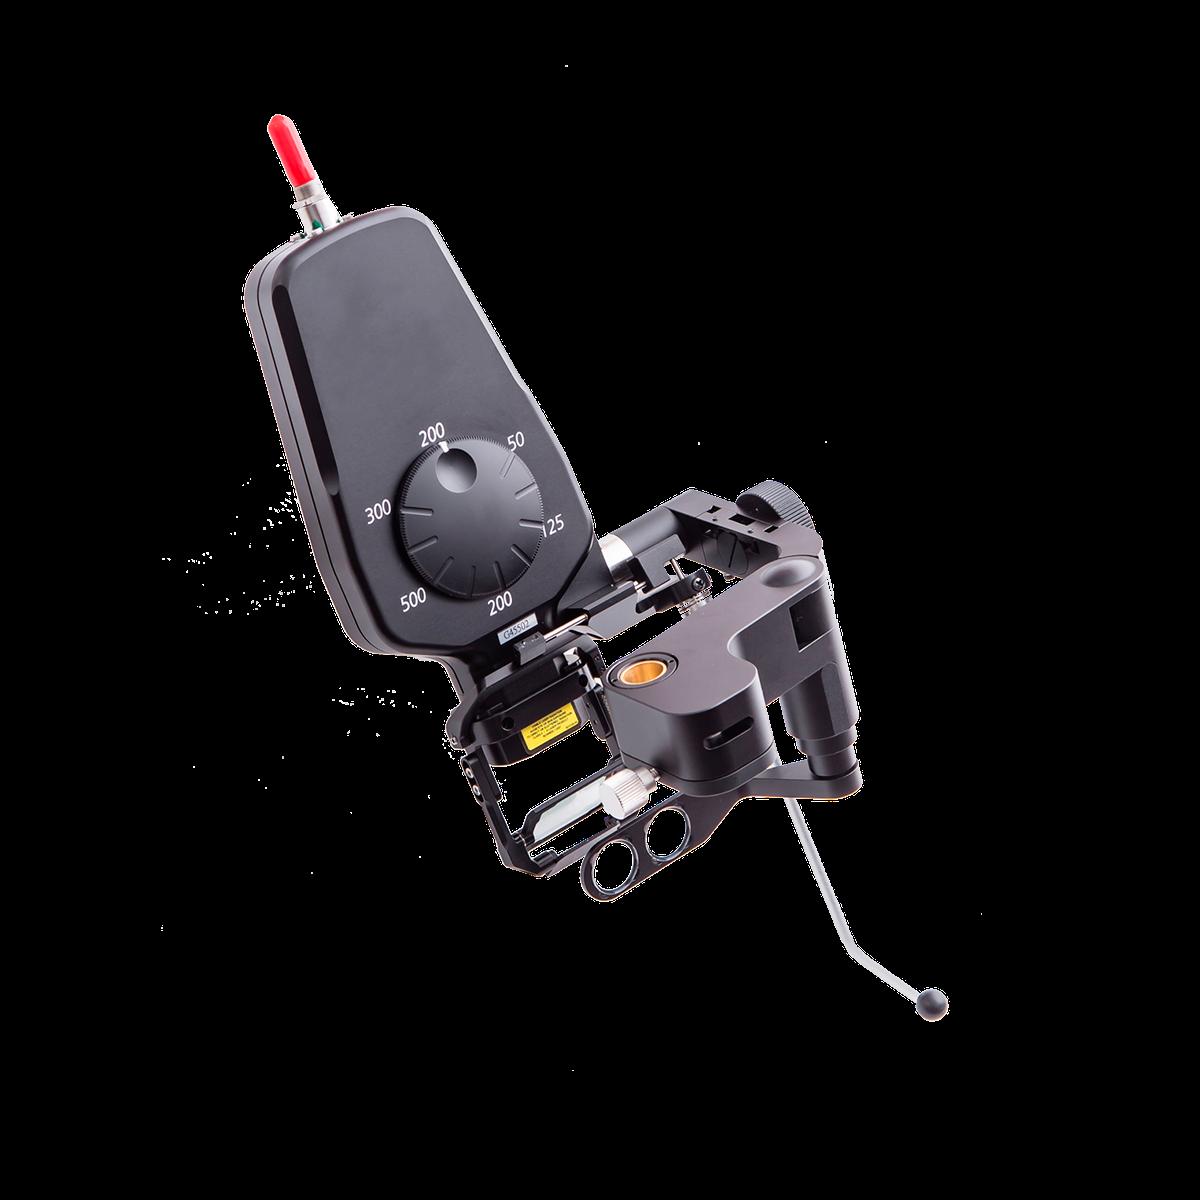 Micromanipulator